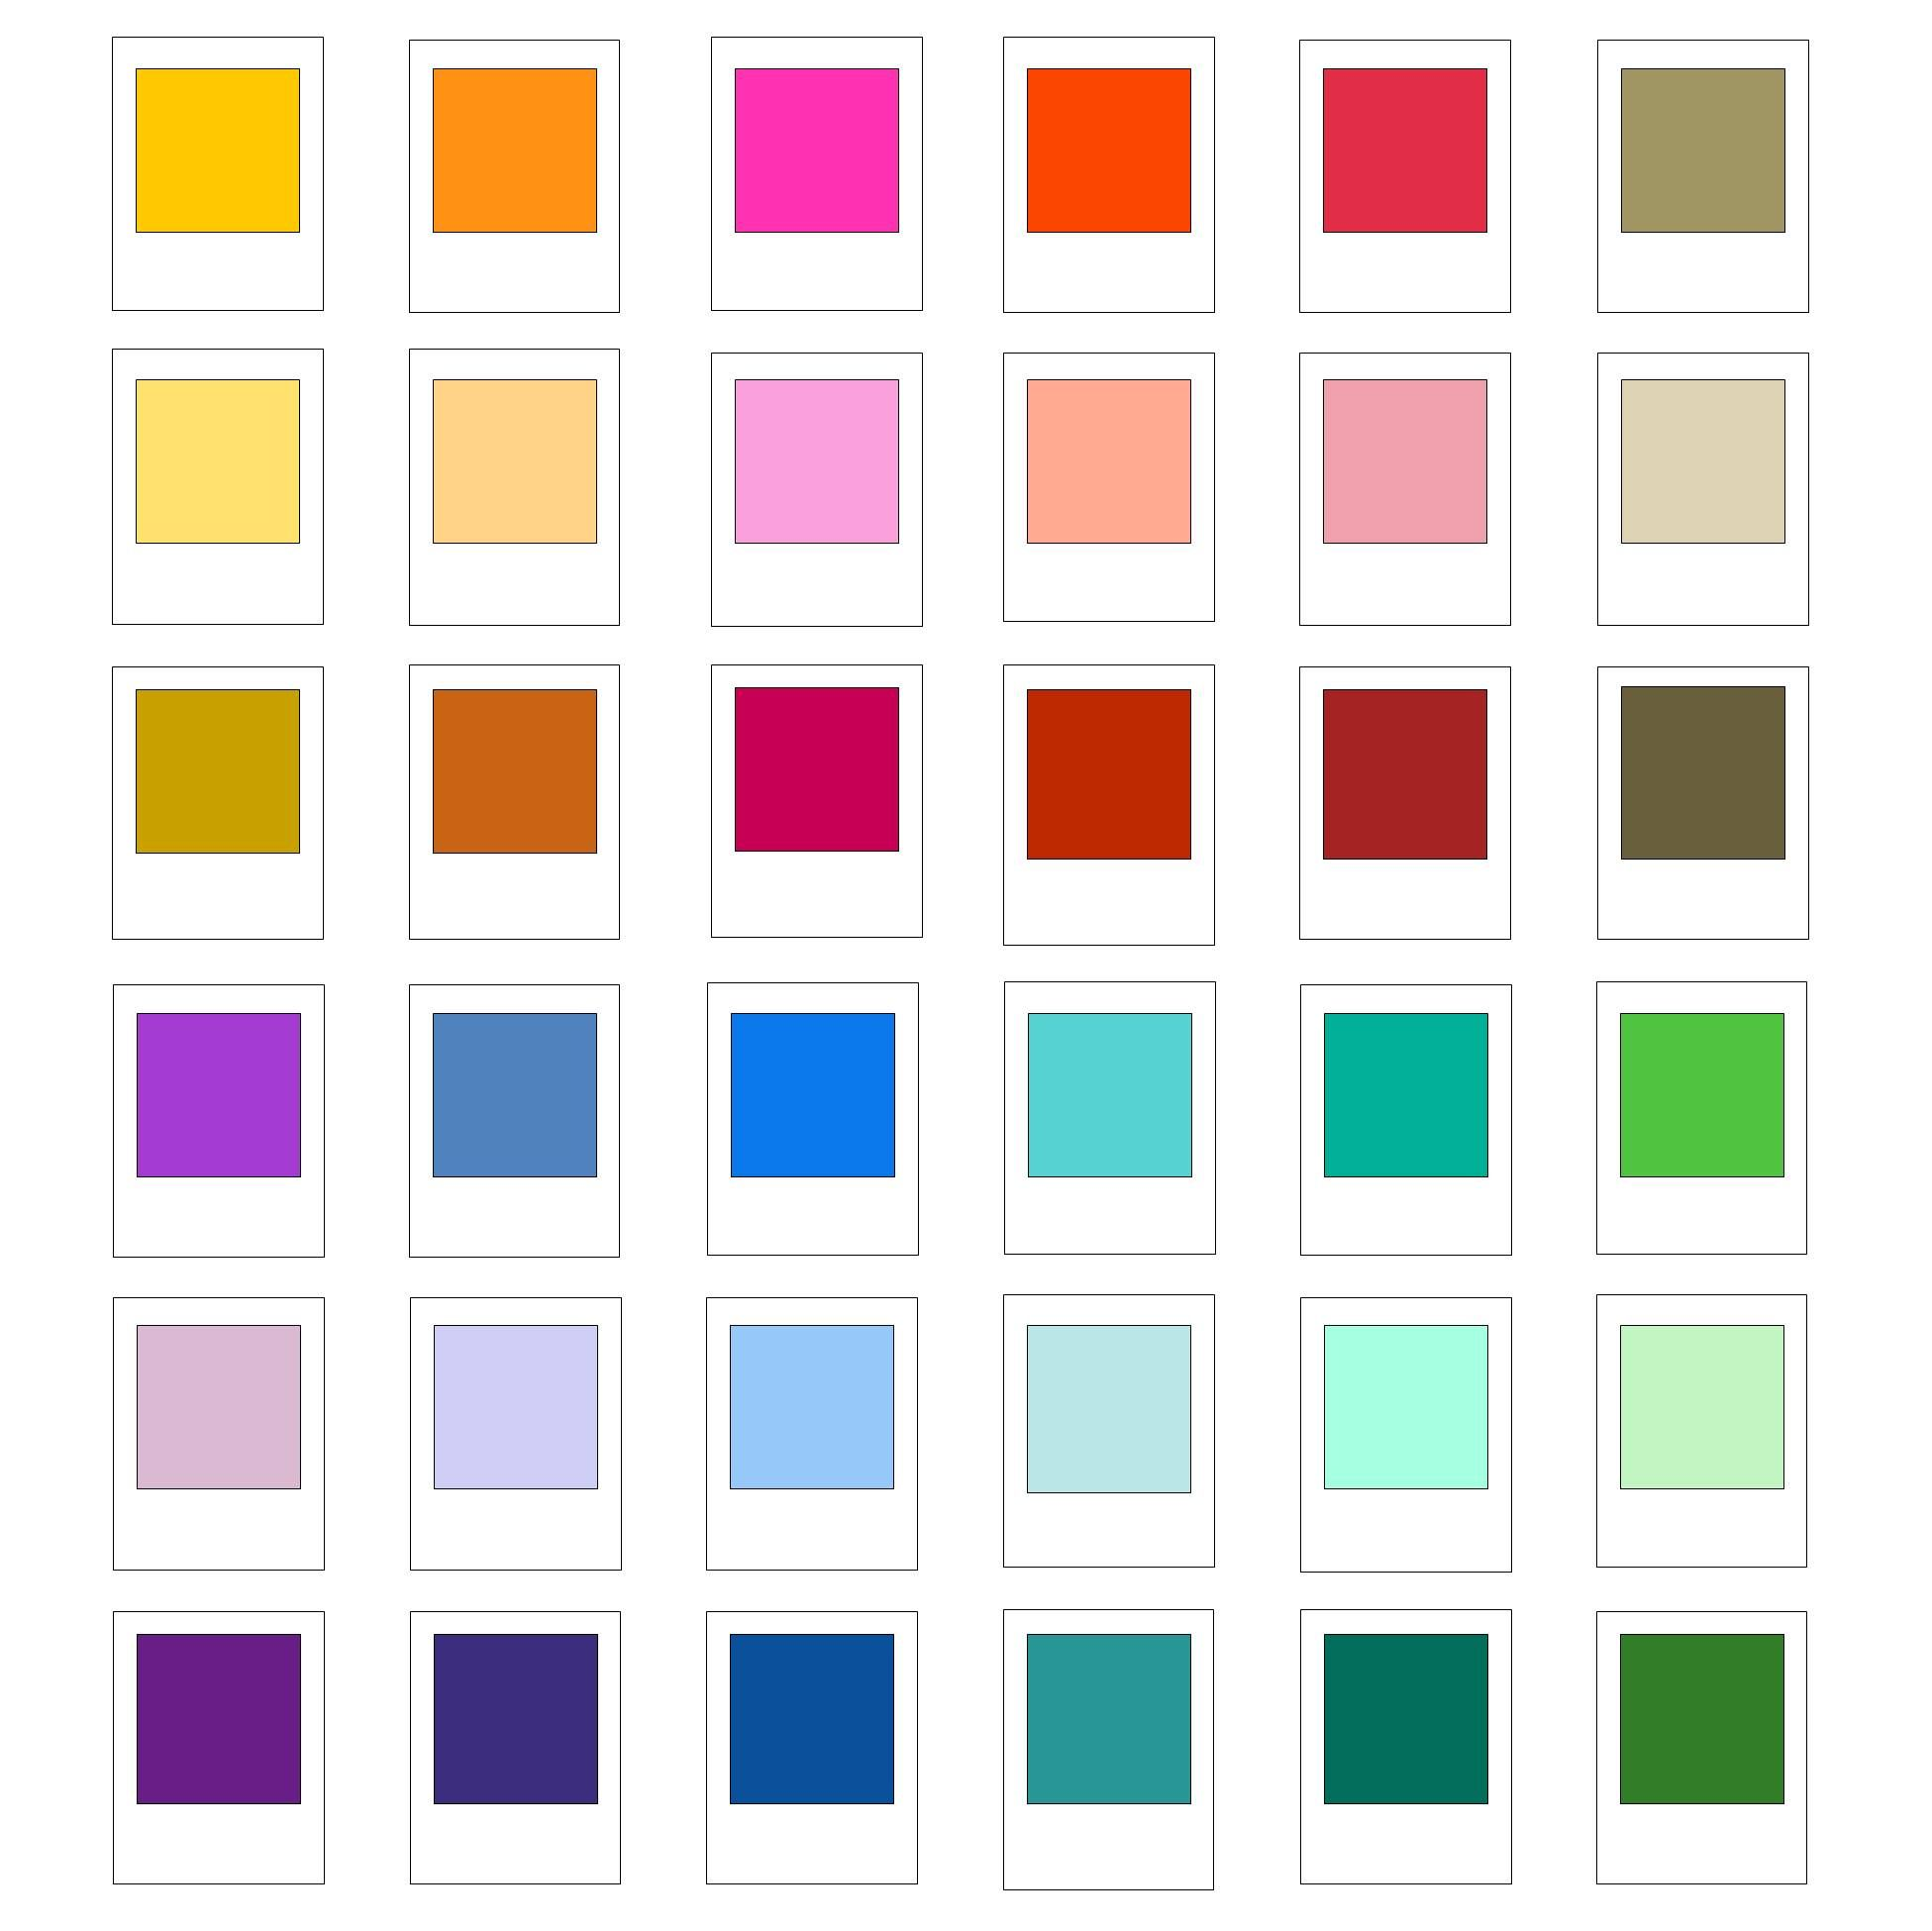 Pin by Zena O'Connor • Colour • Desig on Colour Inspo